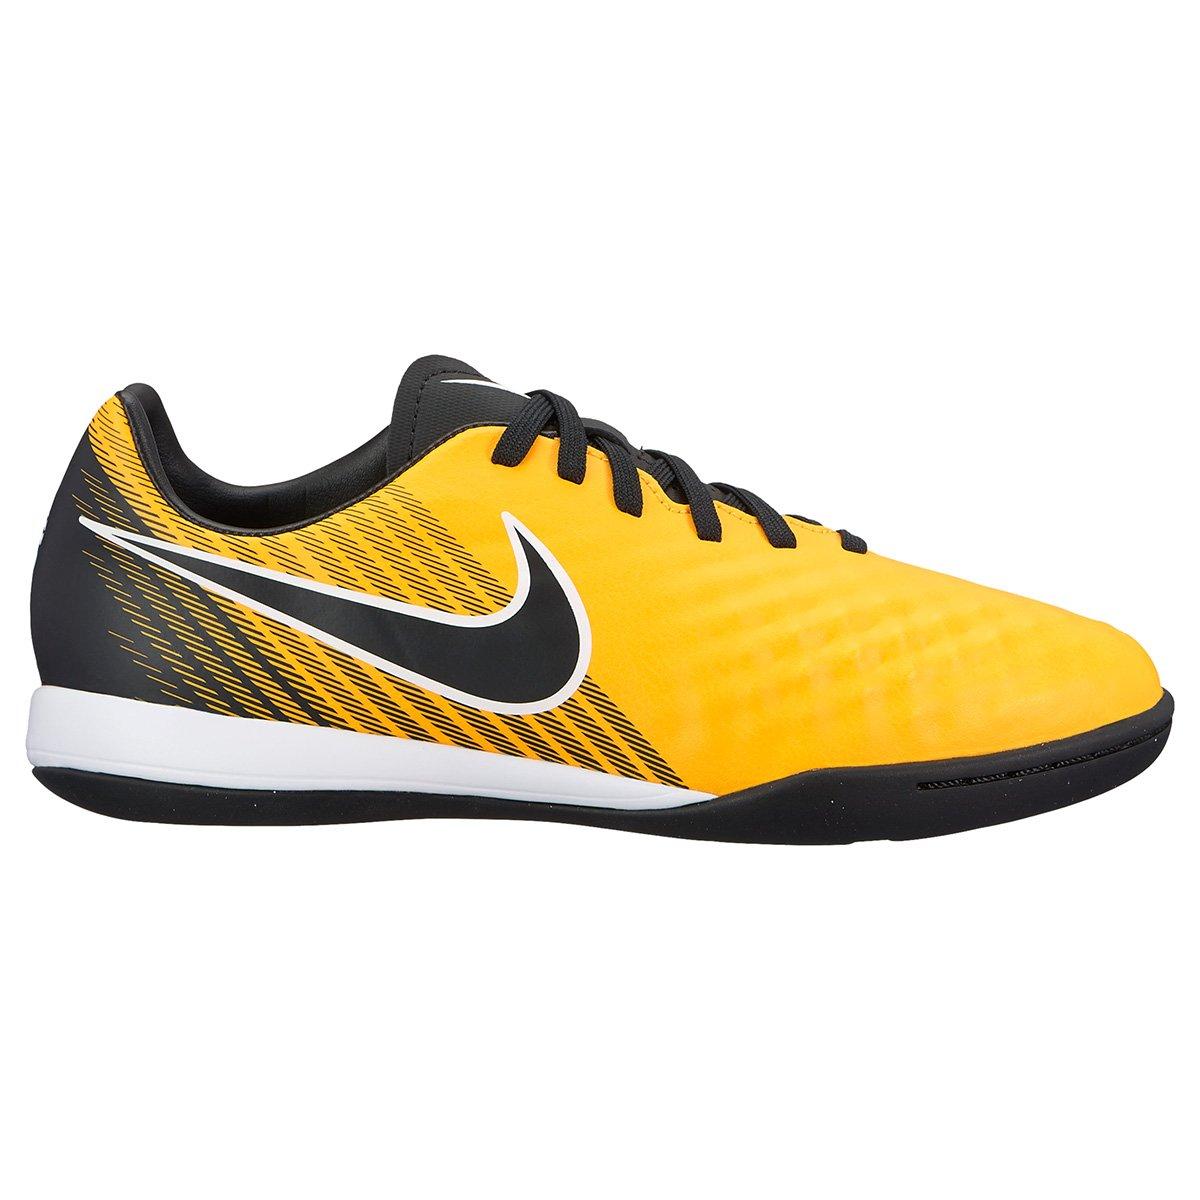 ... Chuteira Futsal Infantil Nike Magista Onda 2 IC - Compre Agora Netshoes  best wholesaler b5dcc be0c6 ... 7976e1d074832